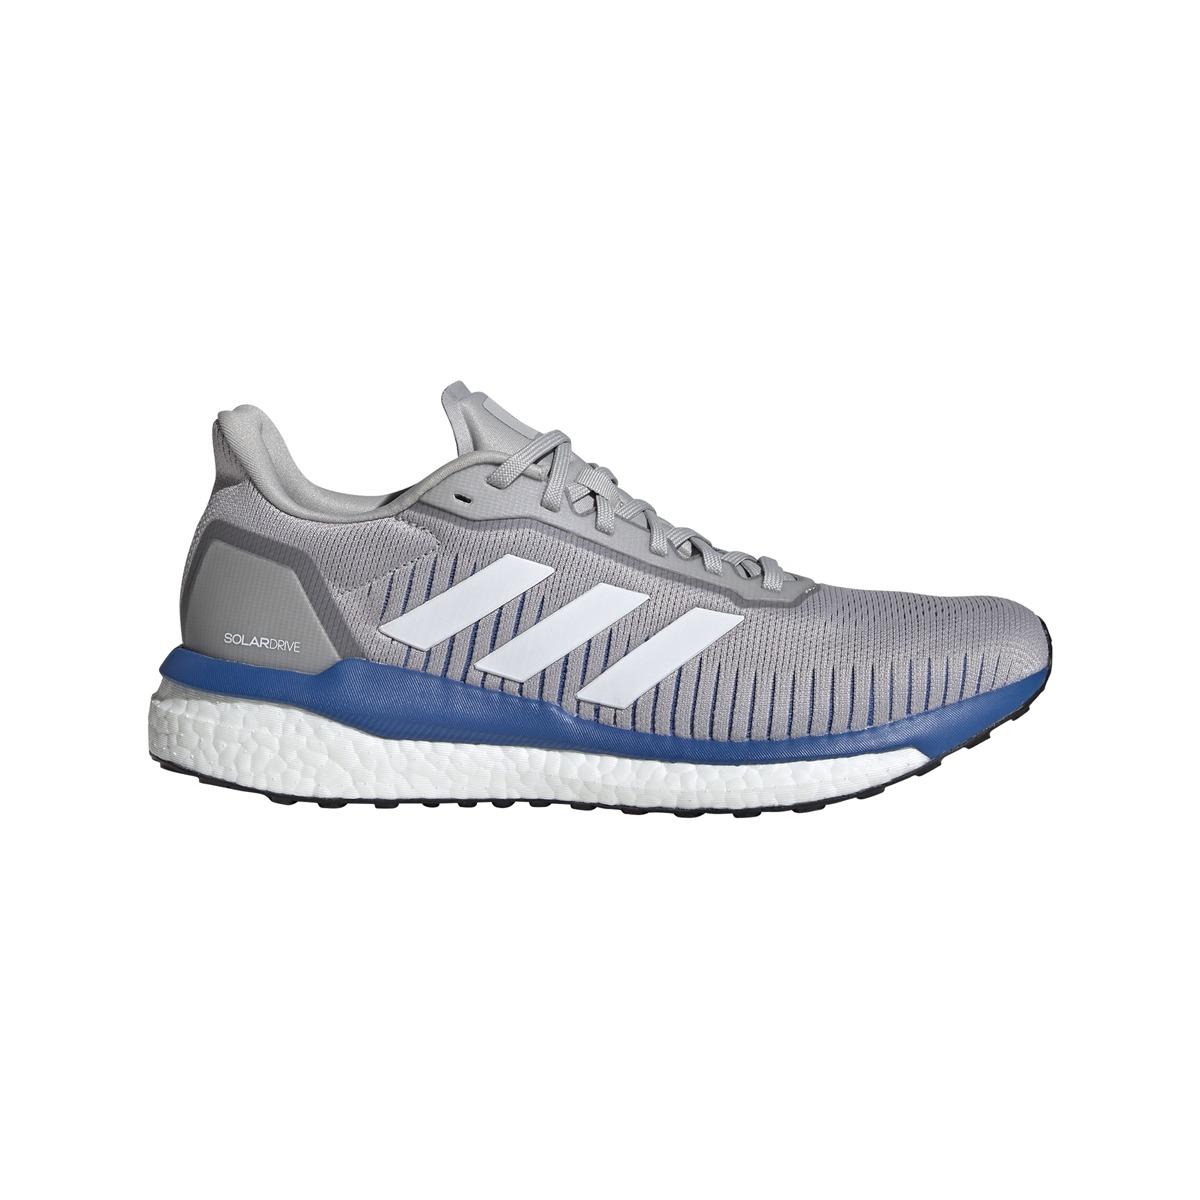 Zapatillas adidas Running Solar Drive 19 M Hombre Graz